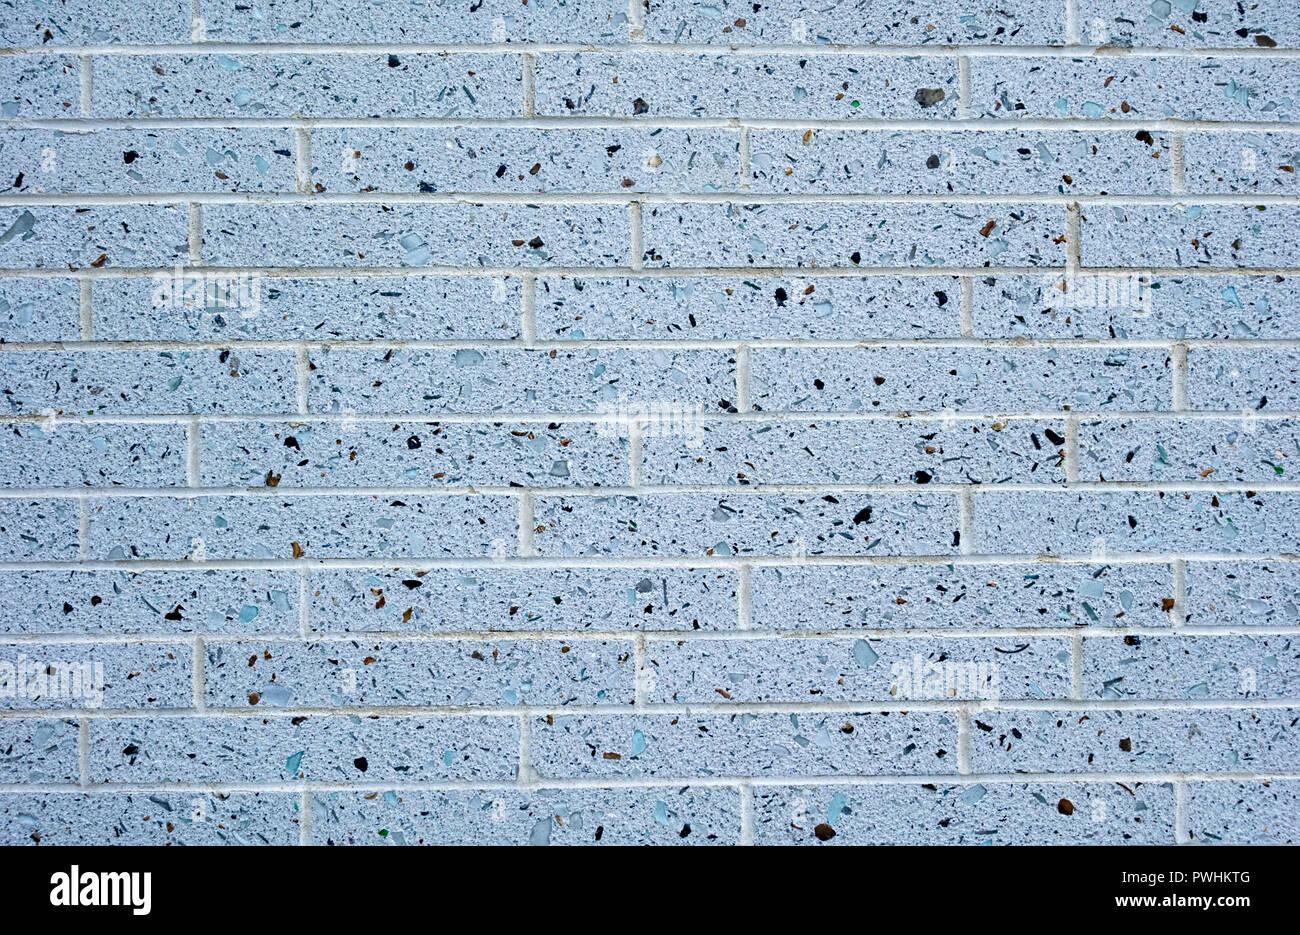 Grey flecked brick wall - Stock Image